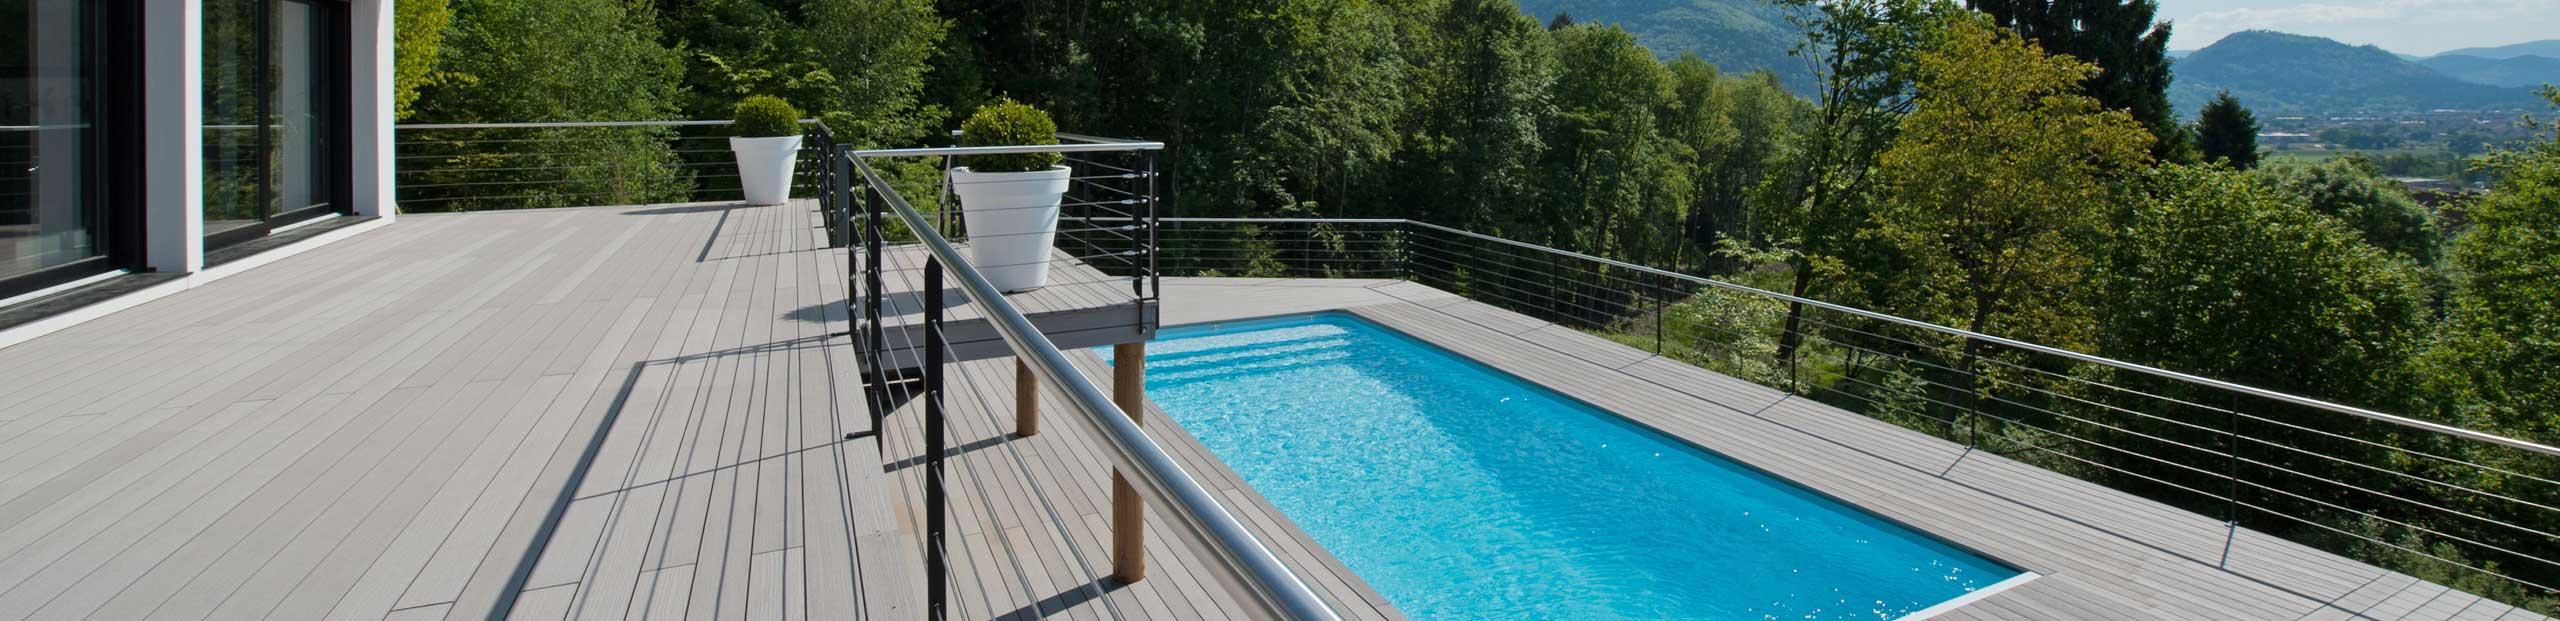 Home | Swimming Pools Magiline destiné Self Piscine